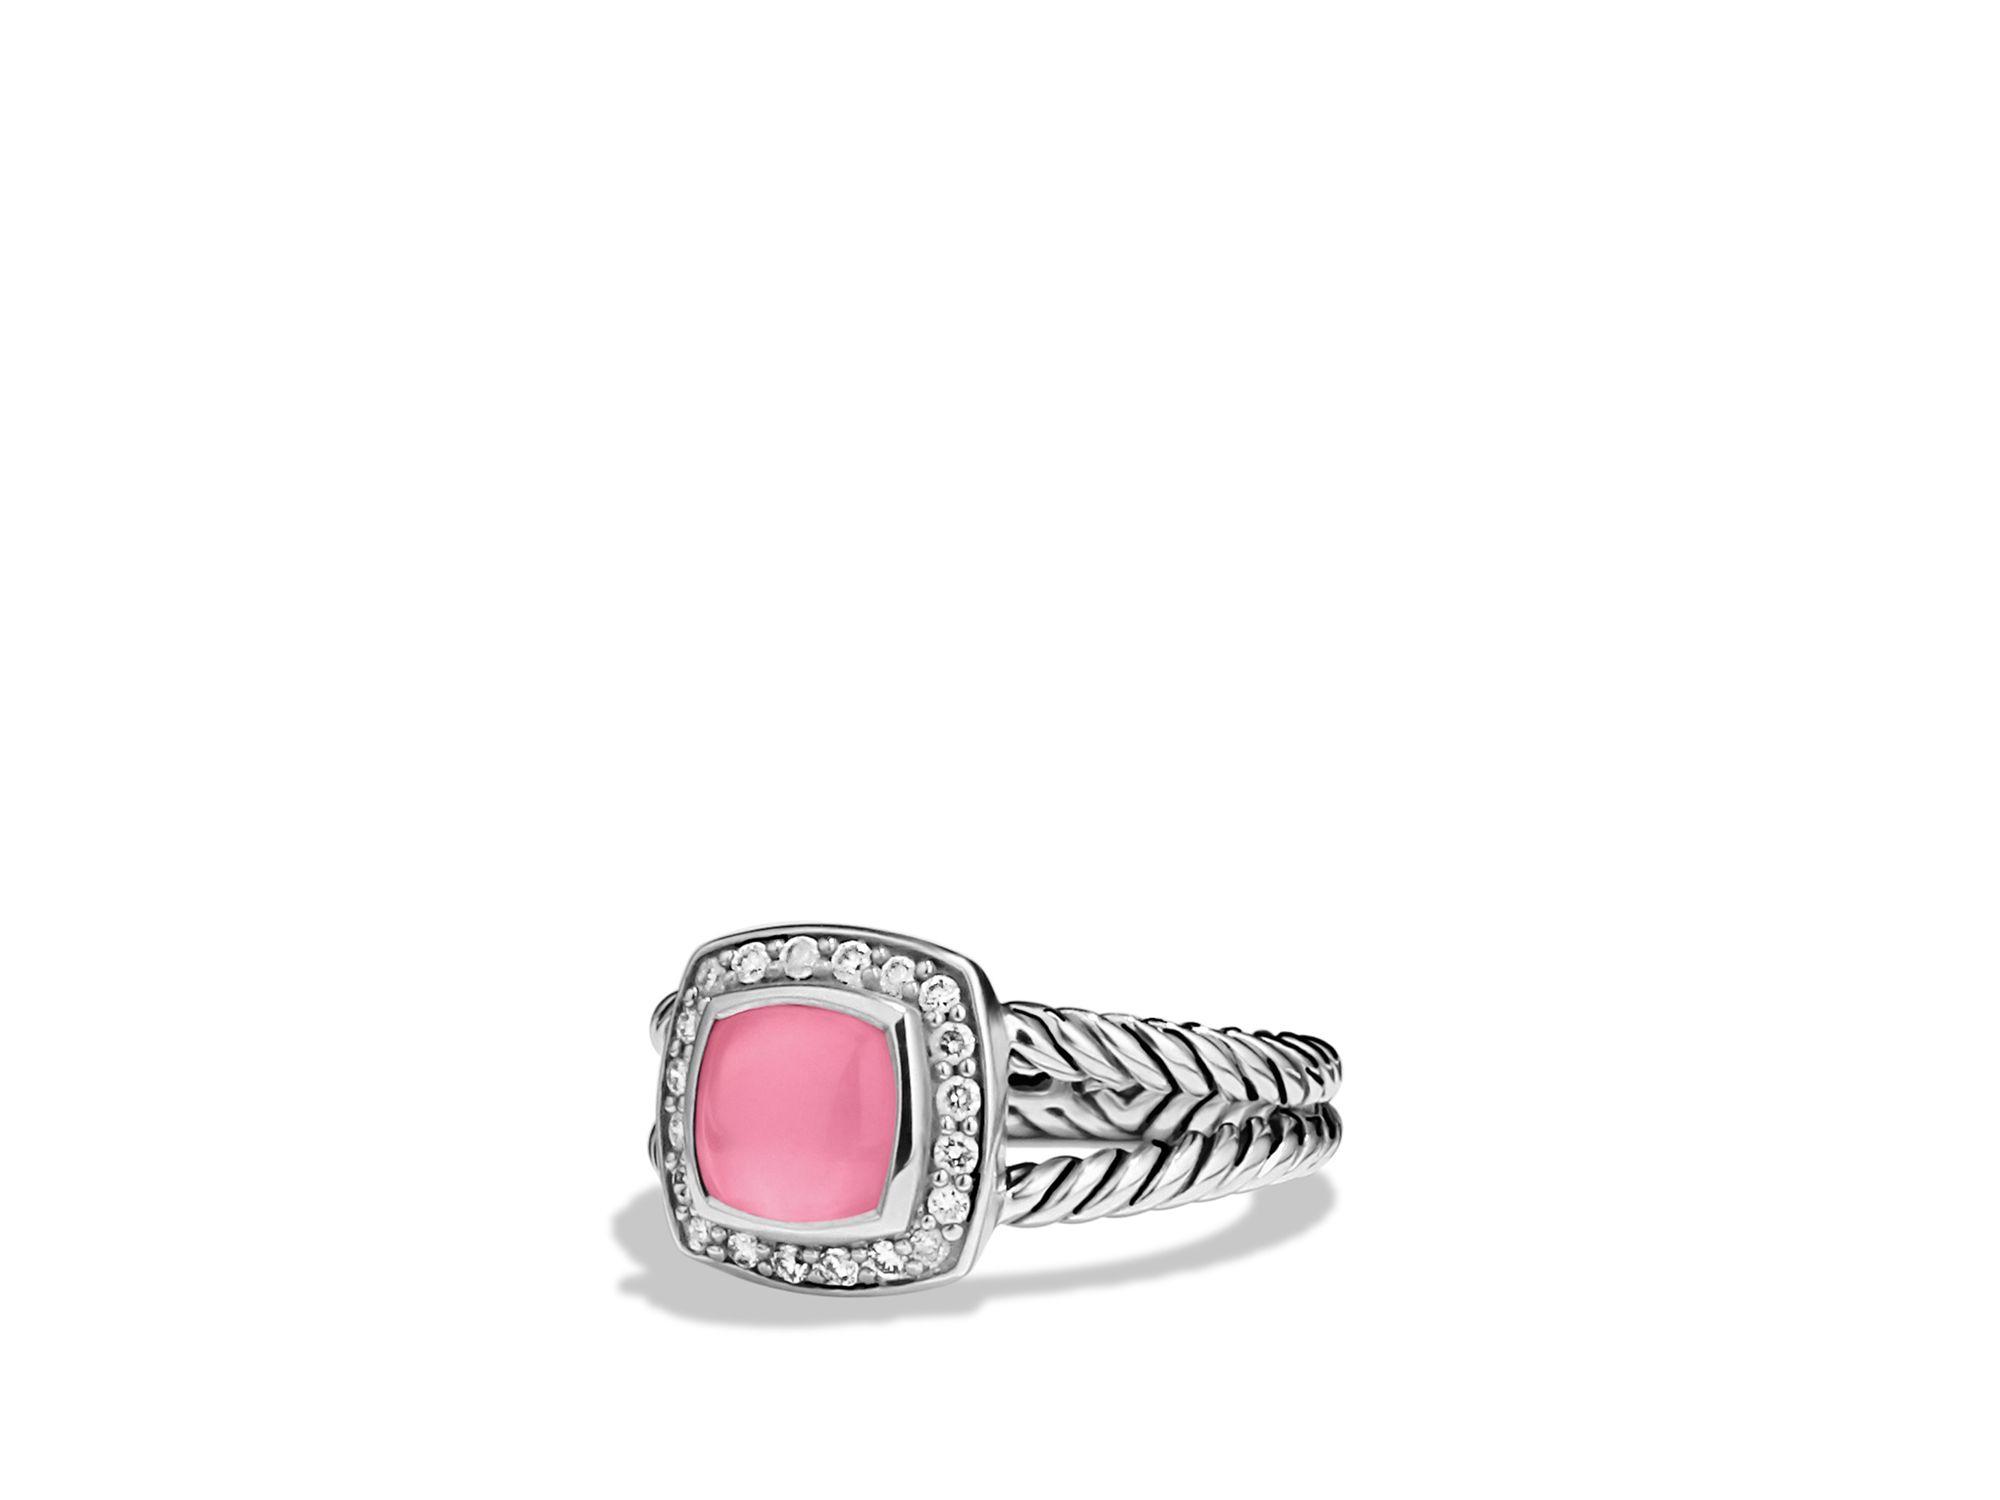 Lyst David Yurman Petite Albion Ring With Pink Tourmaline Amp Diamonds In Pink